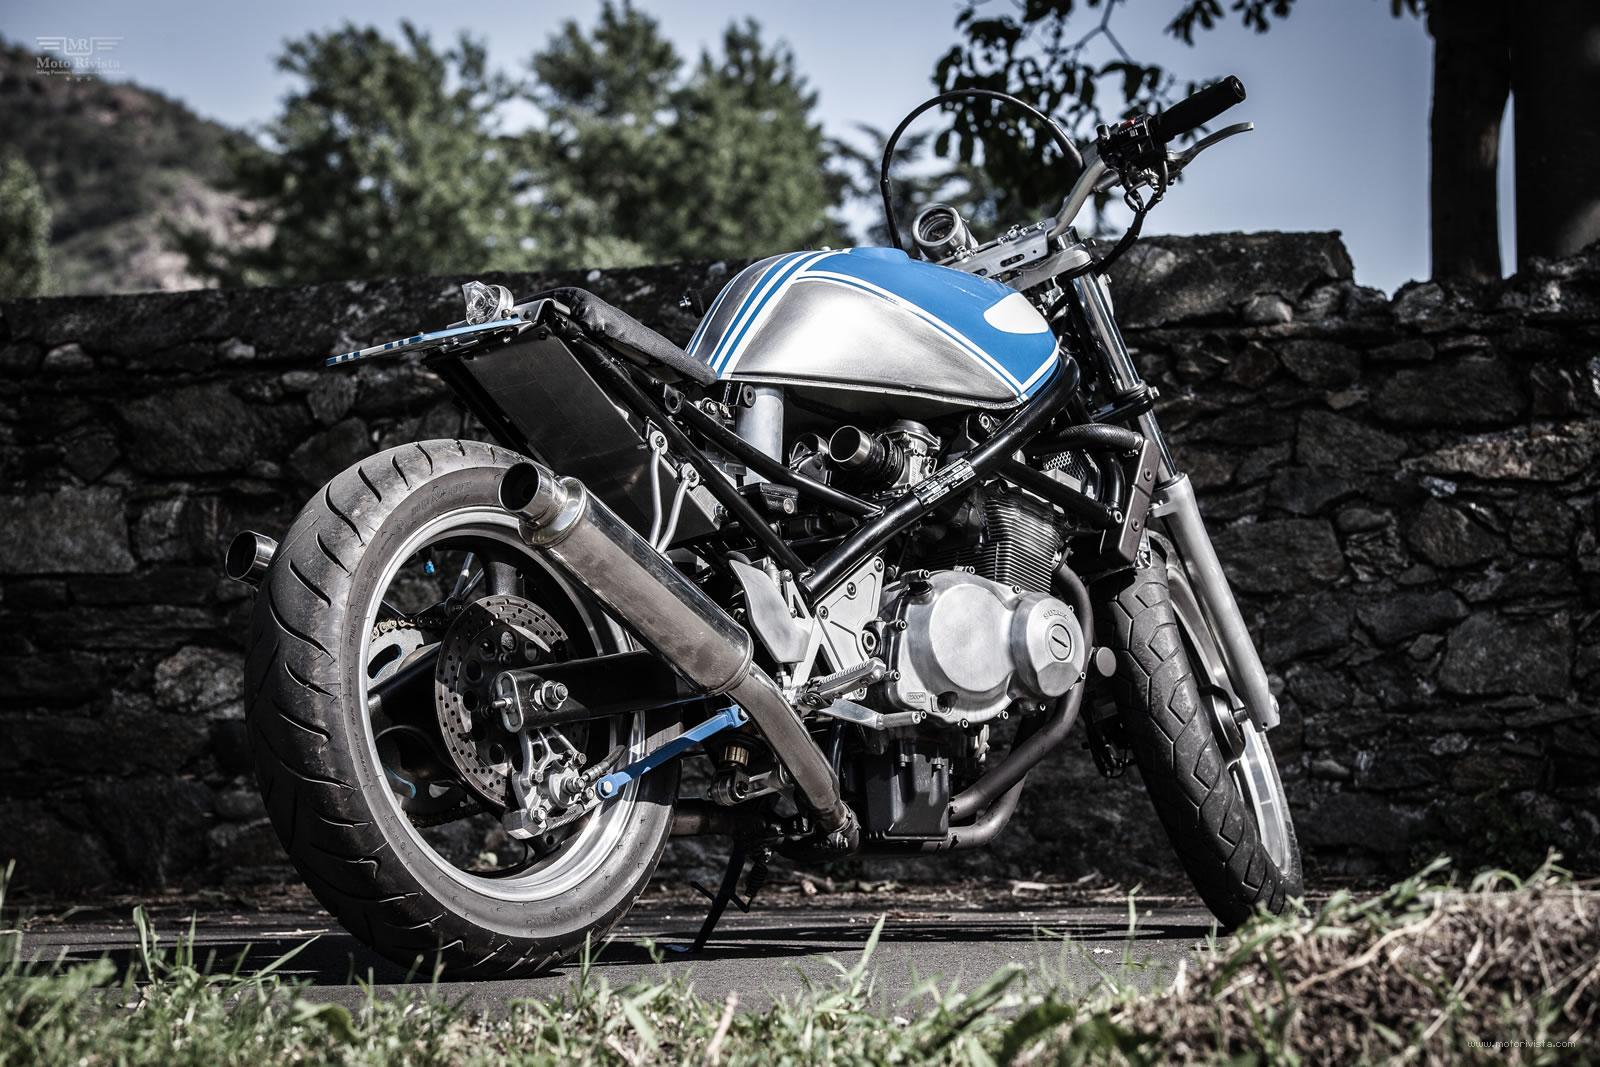 Bandits raras vistas por ahí (web) Italian-custom-Suzuki-GSF400-3